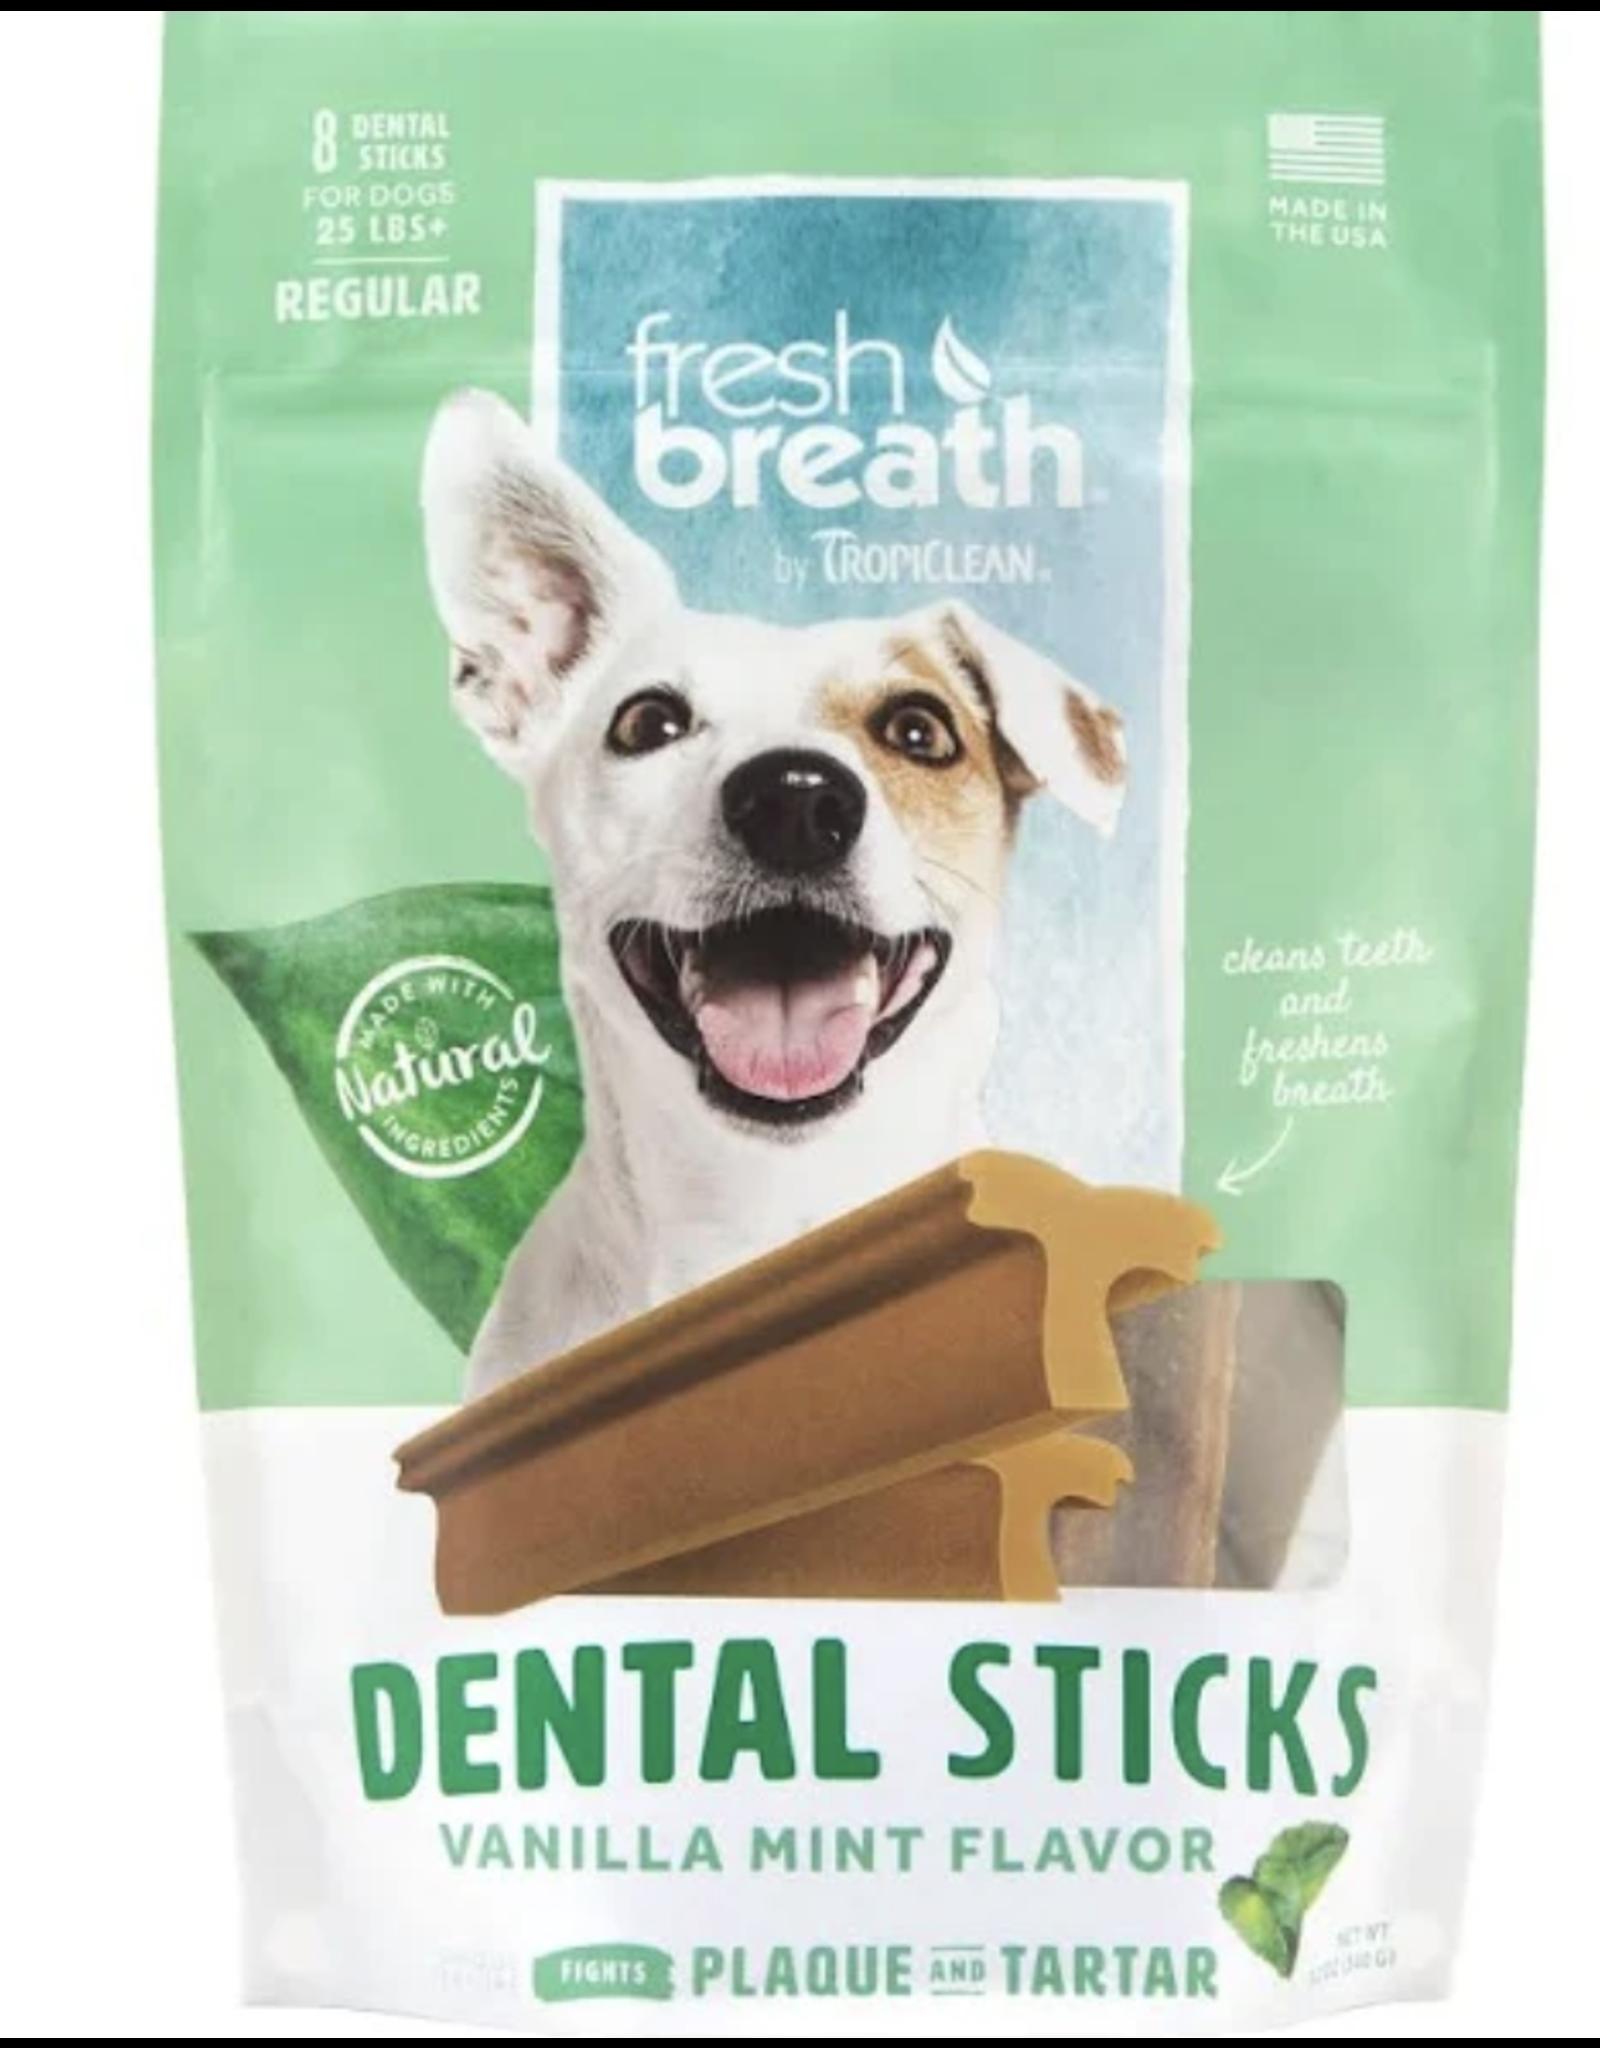 TropiClean TropiClean Fresh Breath Advanced Cleaning Rawhide-Free Regular Dental Dog Treats, 8 count